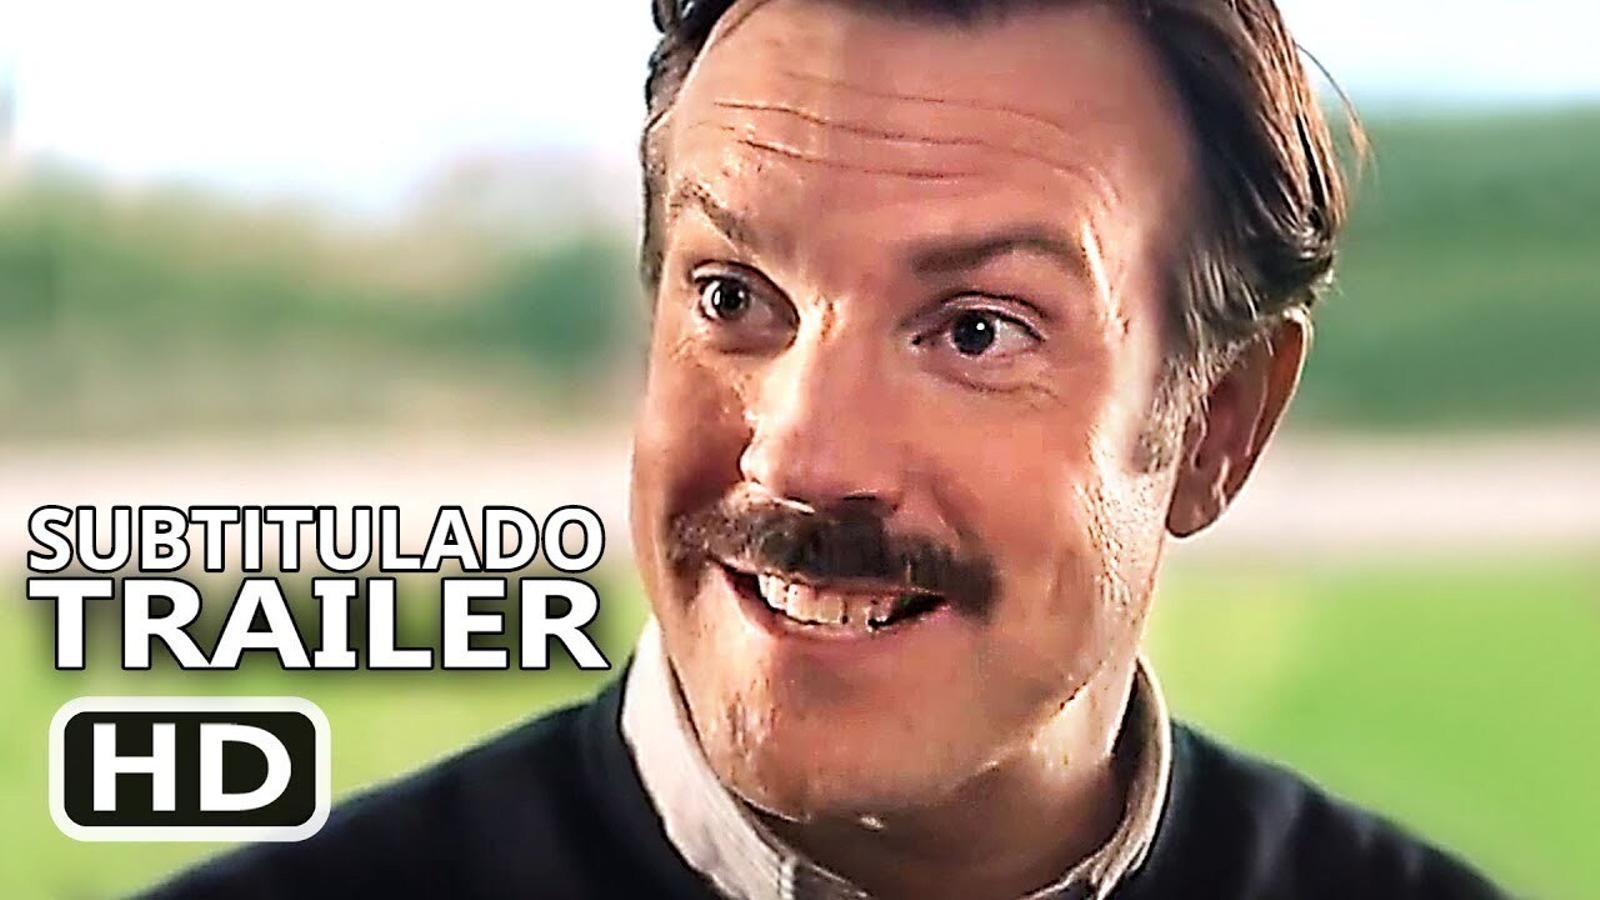 'Ted Lasso', sèrie, tràiler